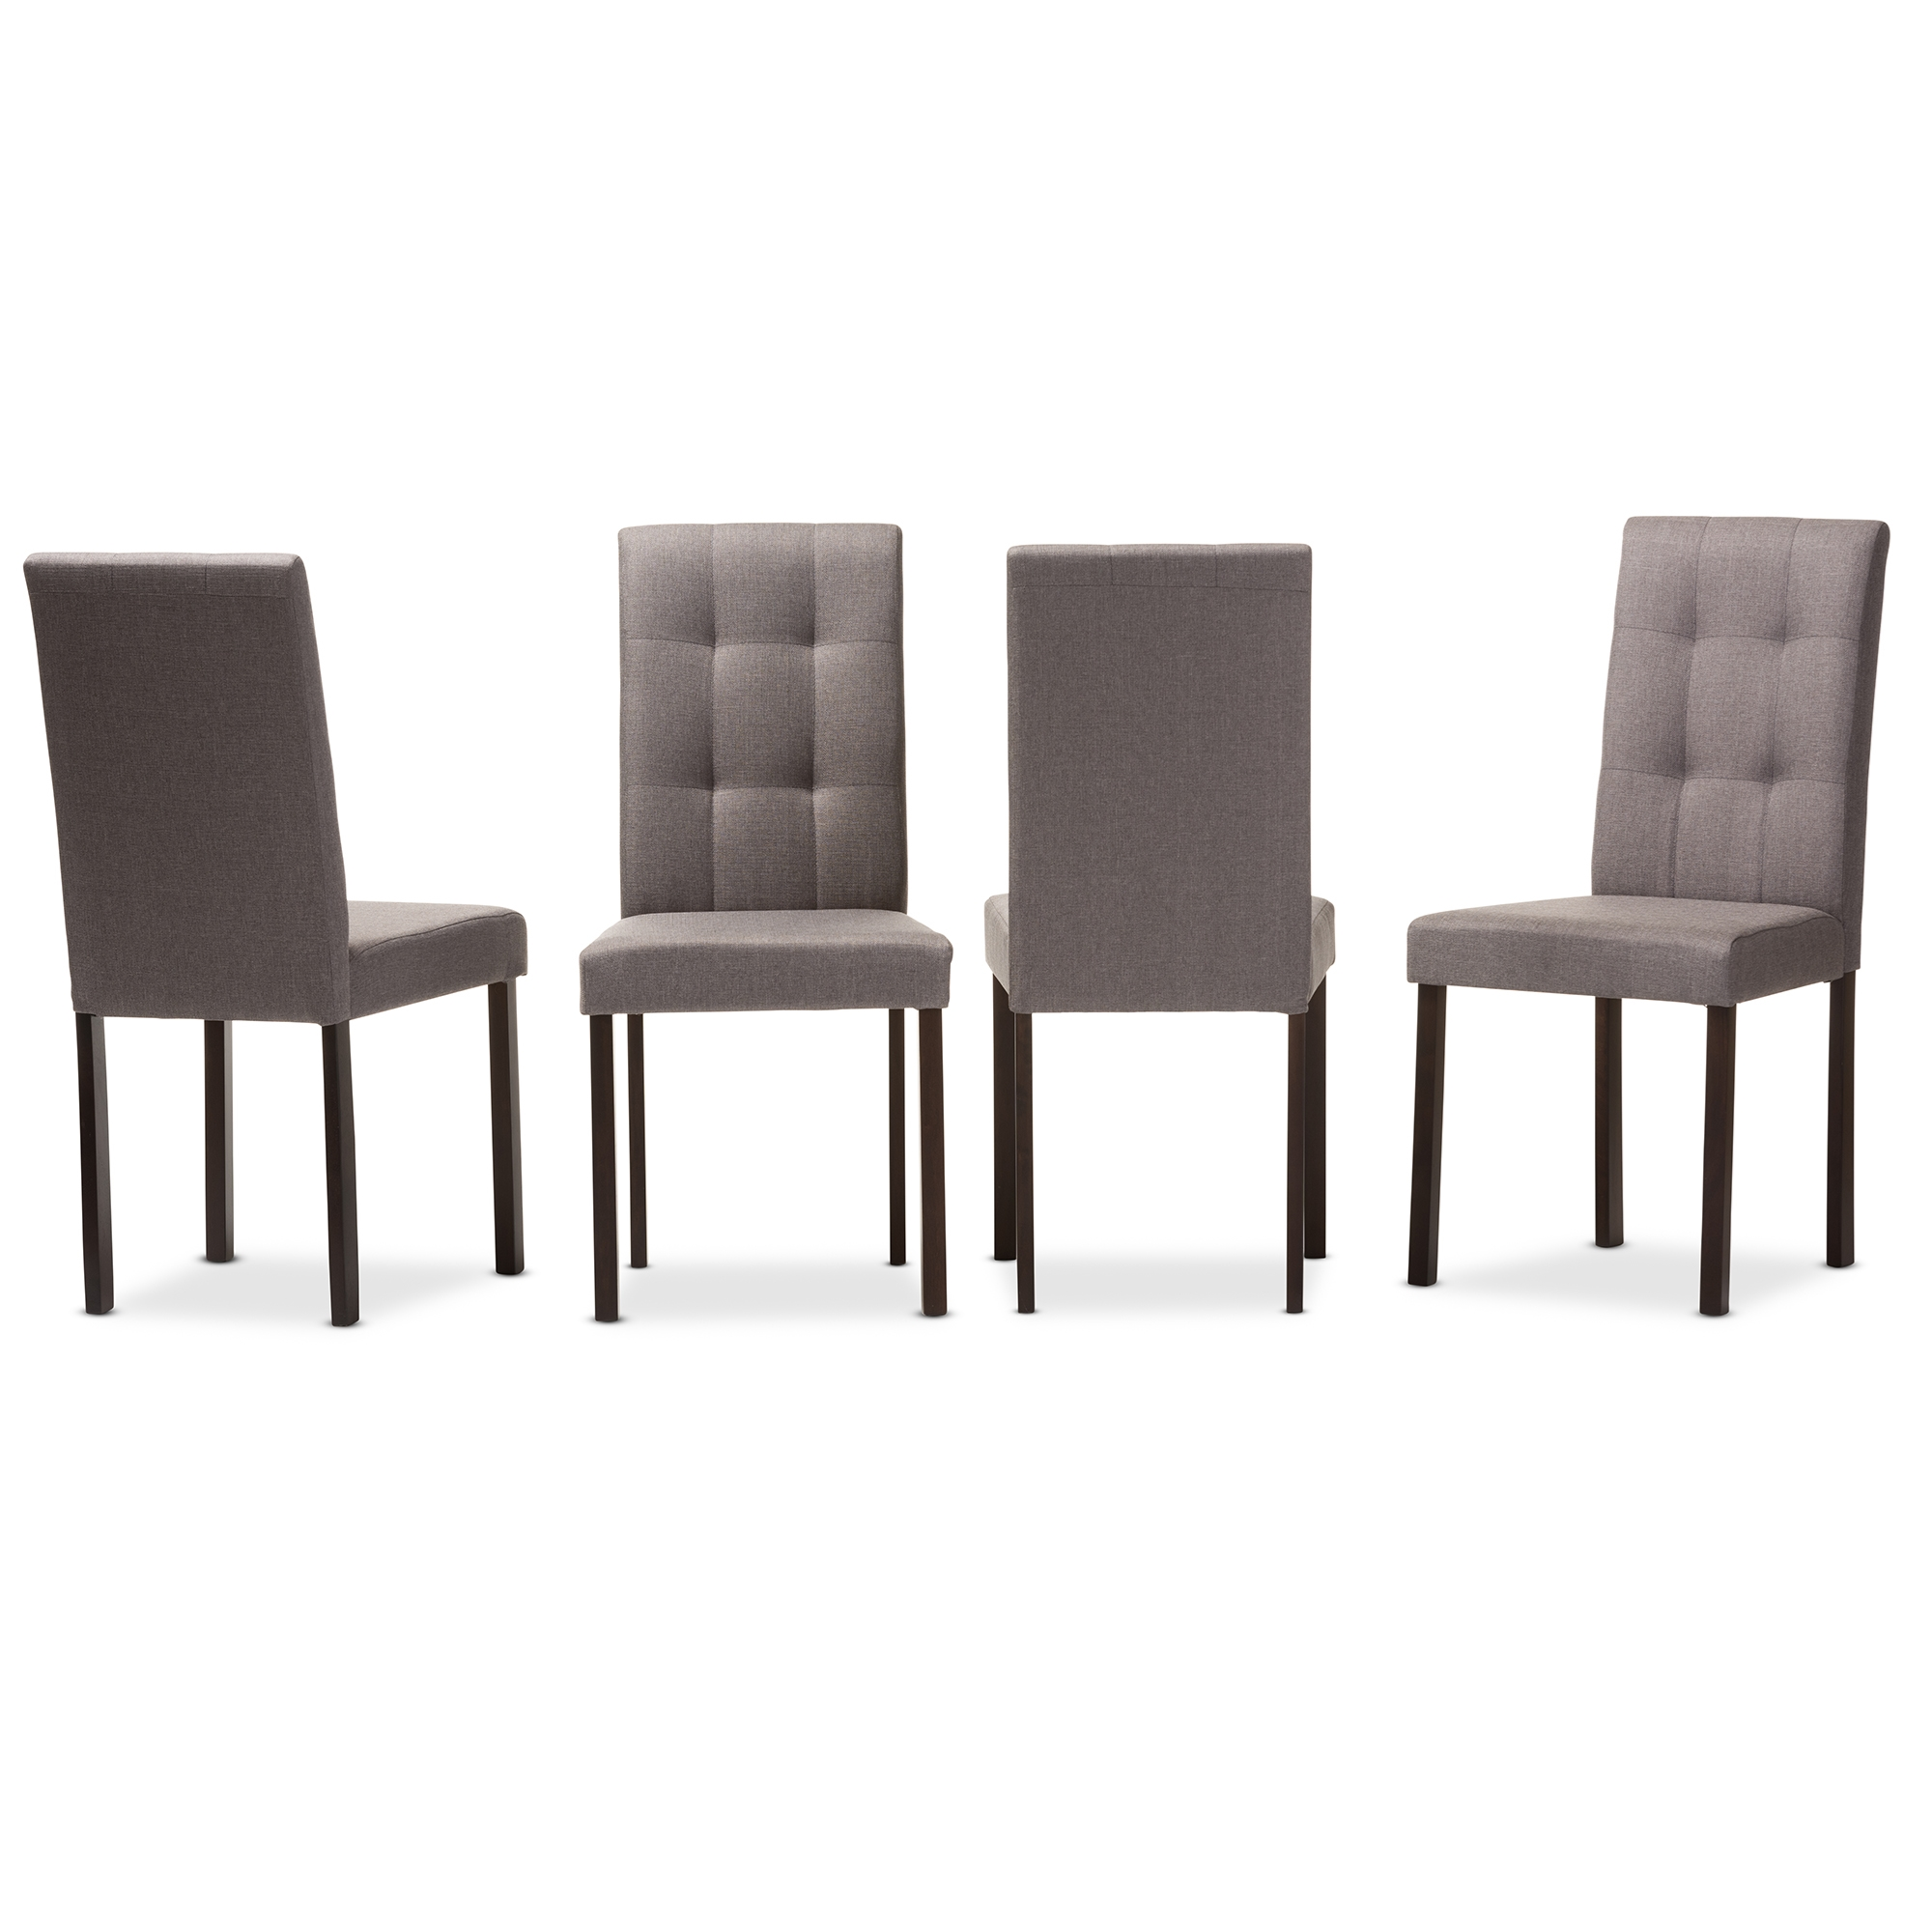 baxton studio wholesale dining chairs wholesale dining room rh baxtonstudio com wholesale upholstered dining room chairs dining room chairs wholesale price